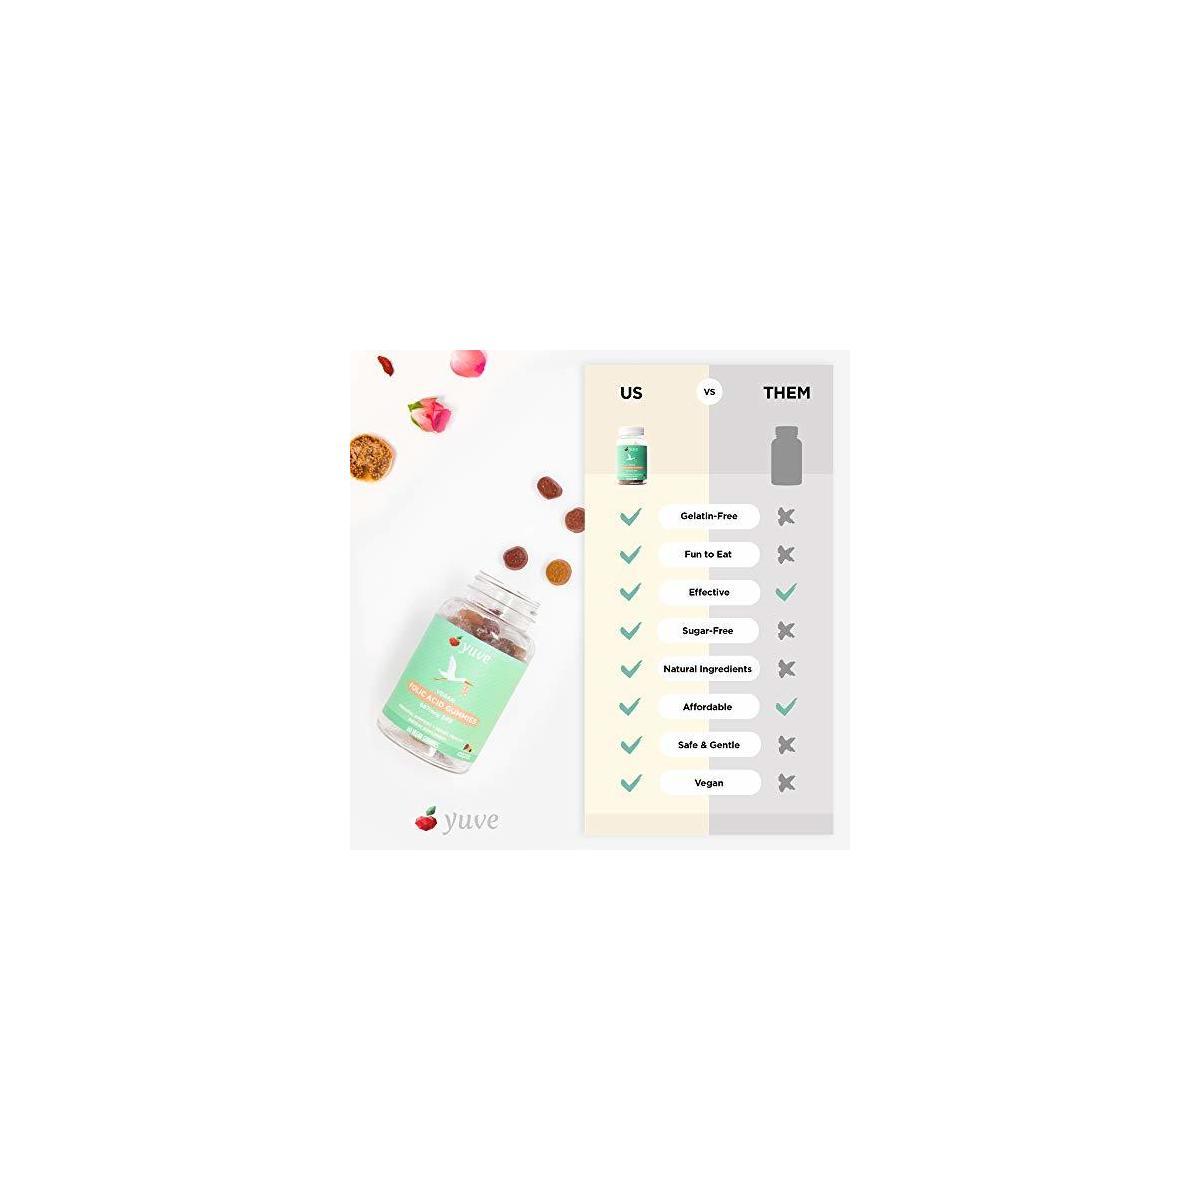 Yuve Vegan Folic Acid Vitamin Gummies 667 mcg DFE - Essential Prenatal Development Support - Maintains Hormal Balance - Cellular & Circulatory Health - Natural, Non-GMO, Gluten & Gelatin Free - 60ct